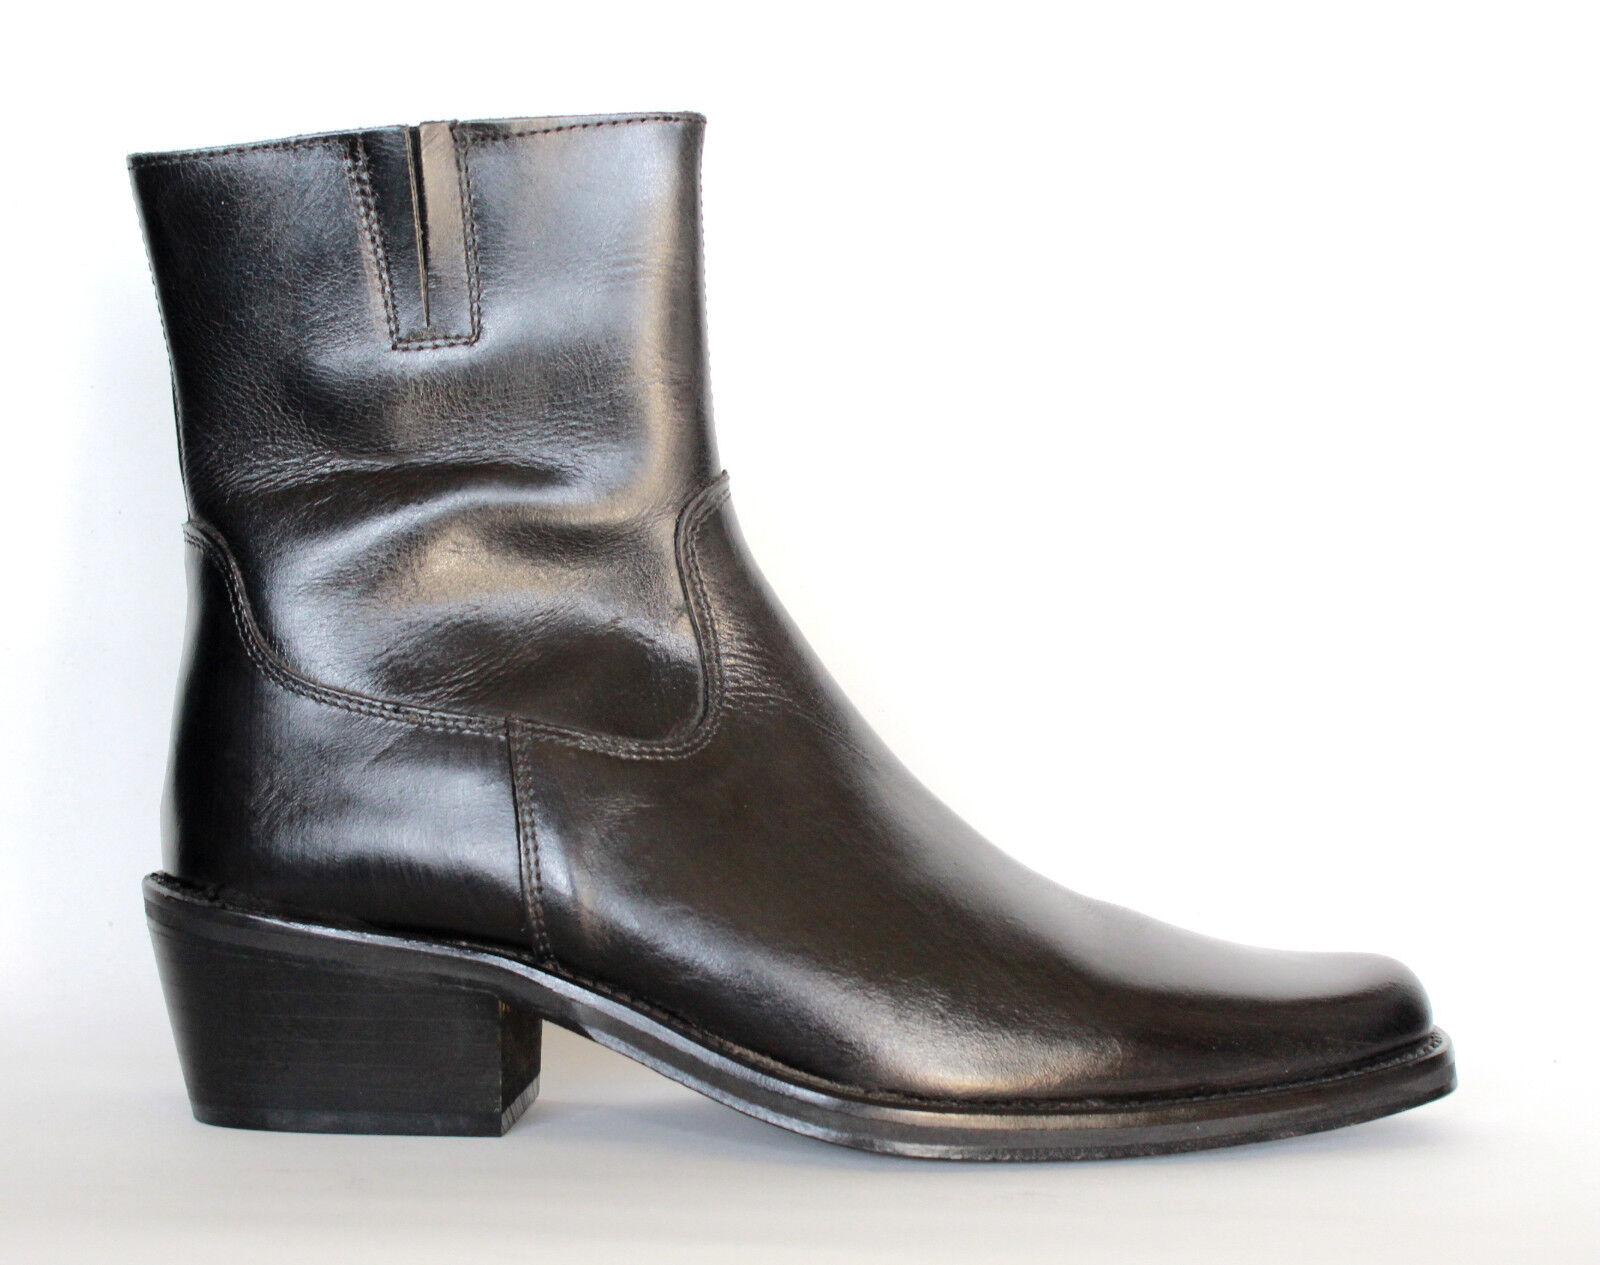 Elegante stivali scarpe invernali TG 40 37 38 39 40 TG 41 nero stivali autunno primavera 914493